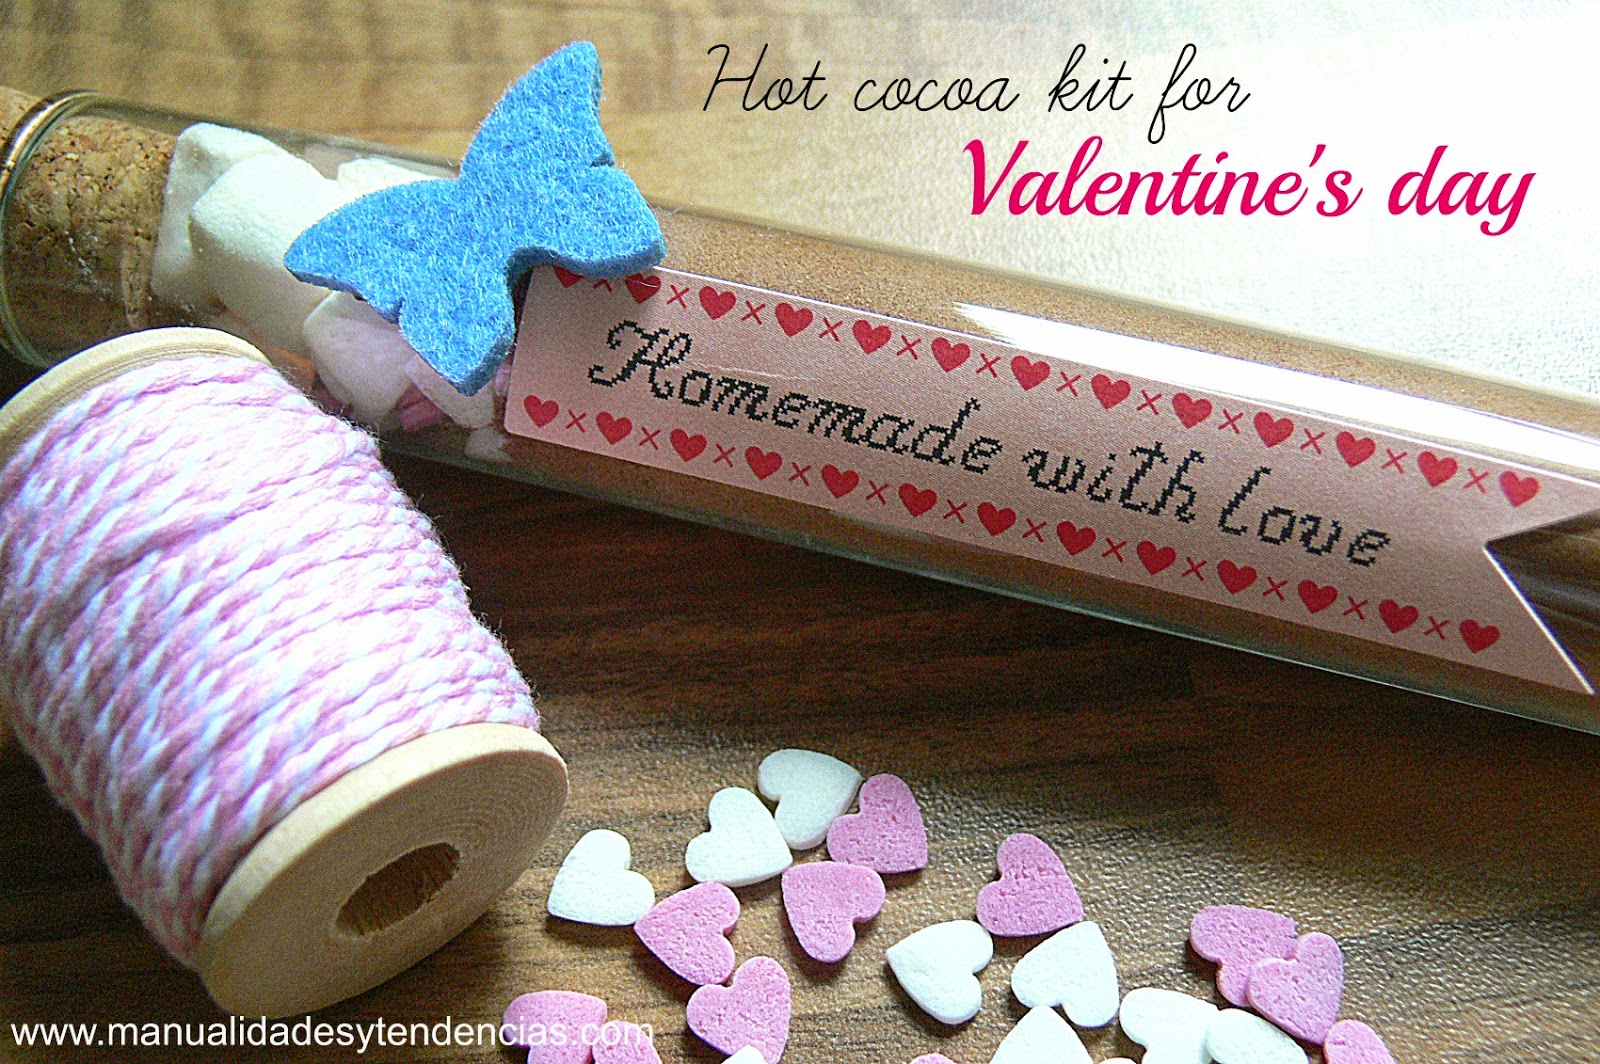 Valentine's day gift idea: Hot cocoa kit